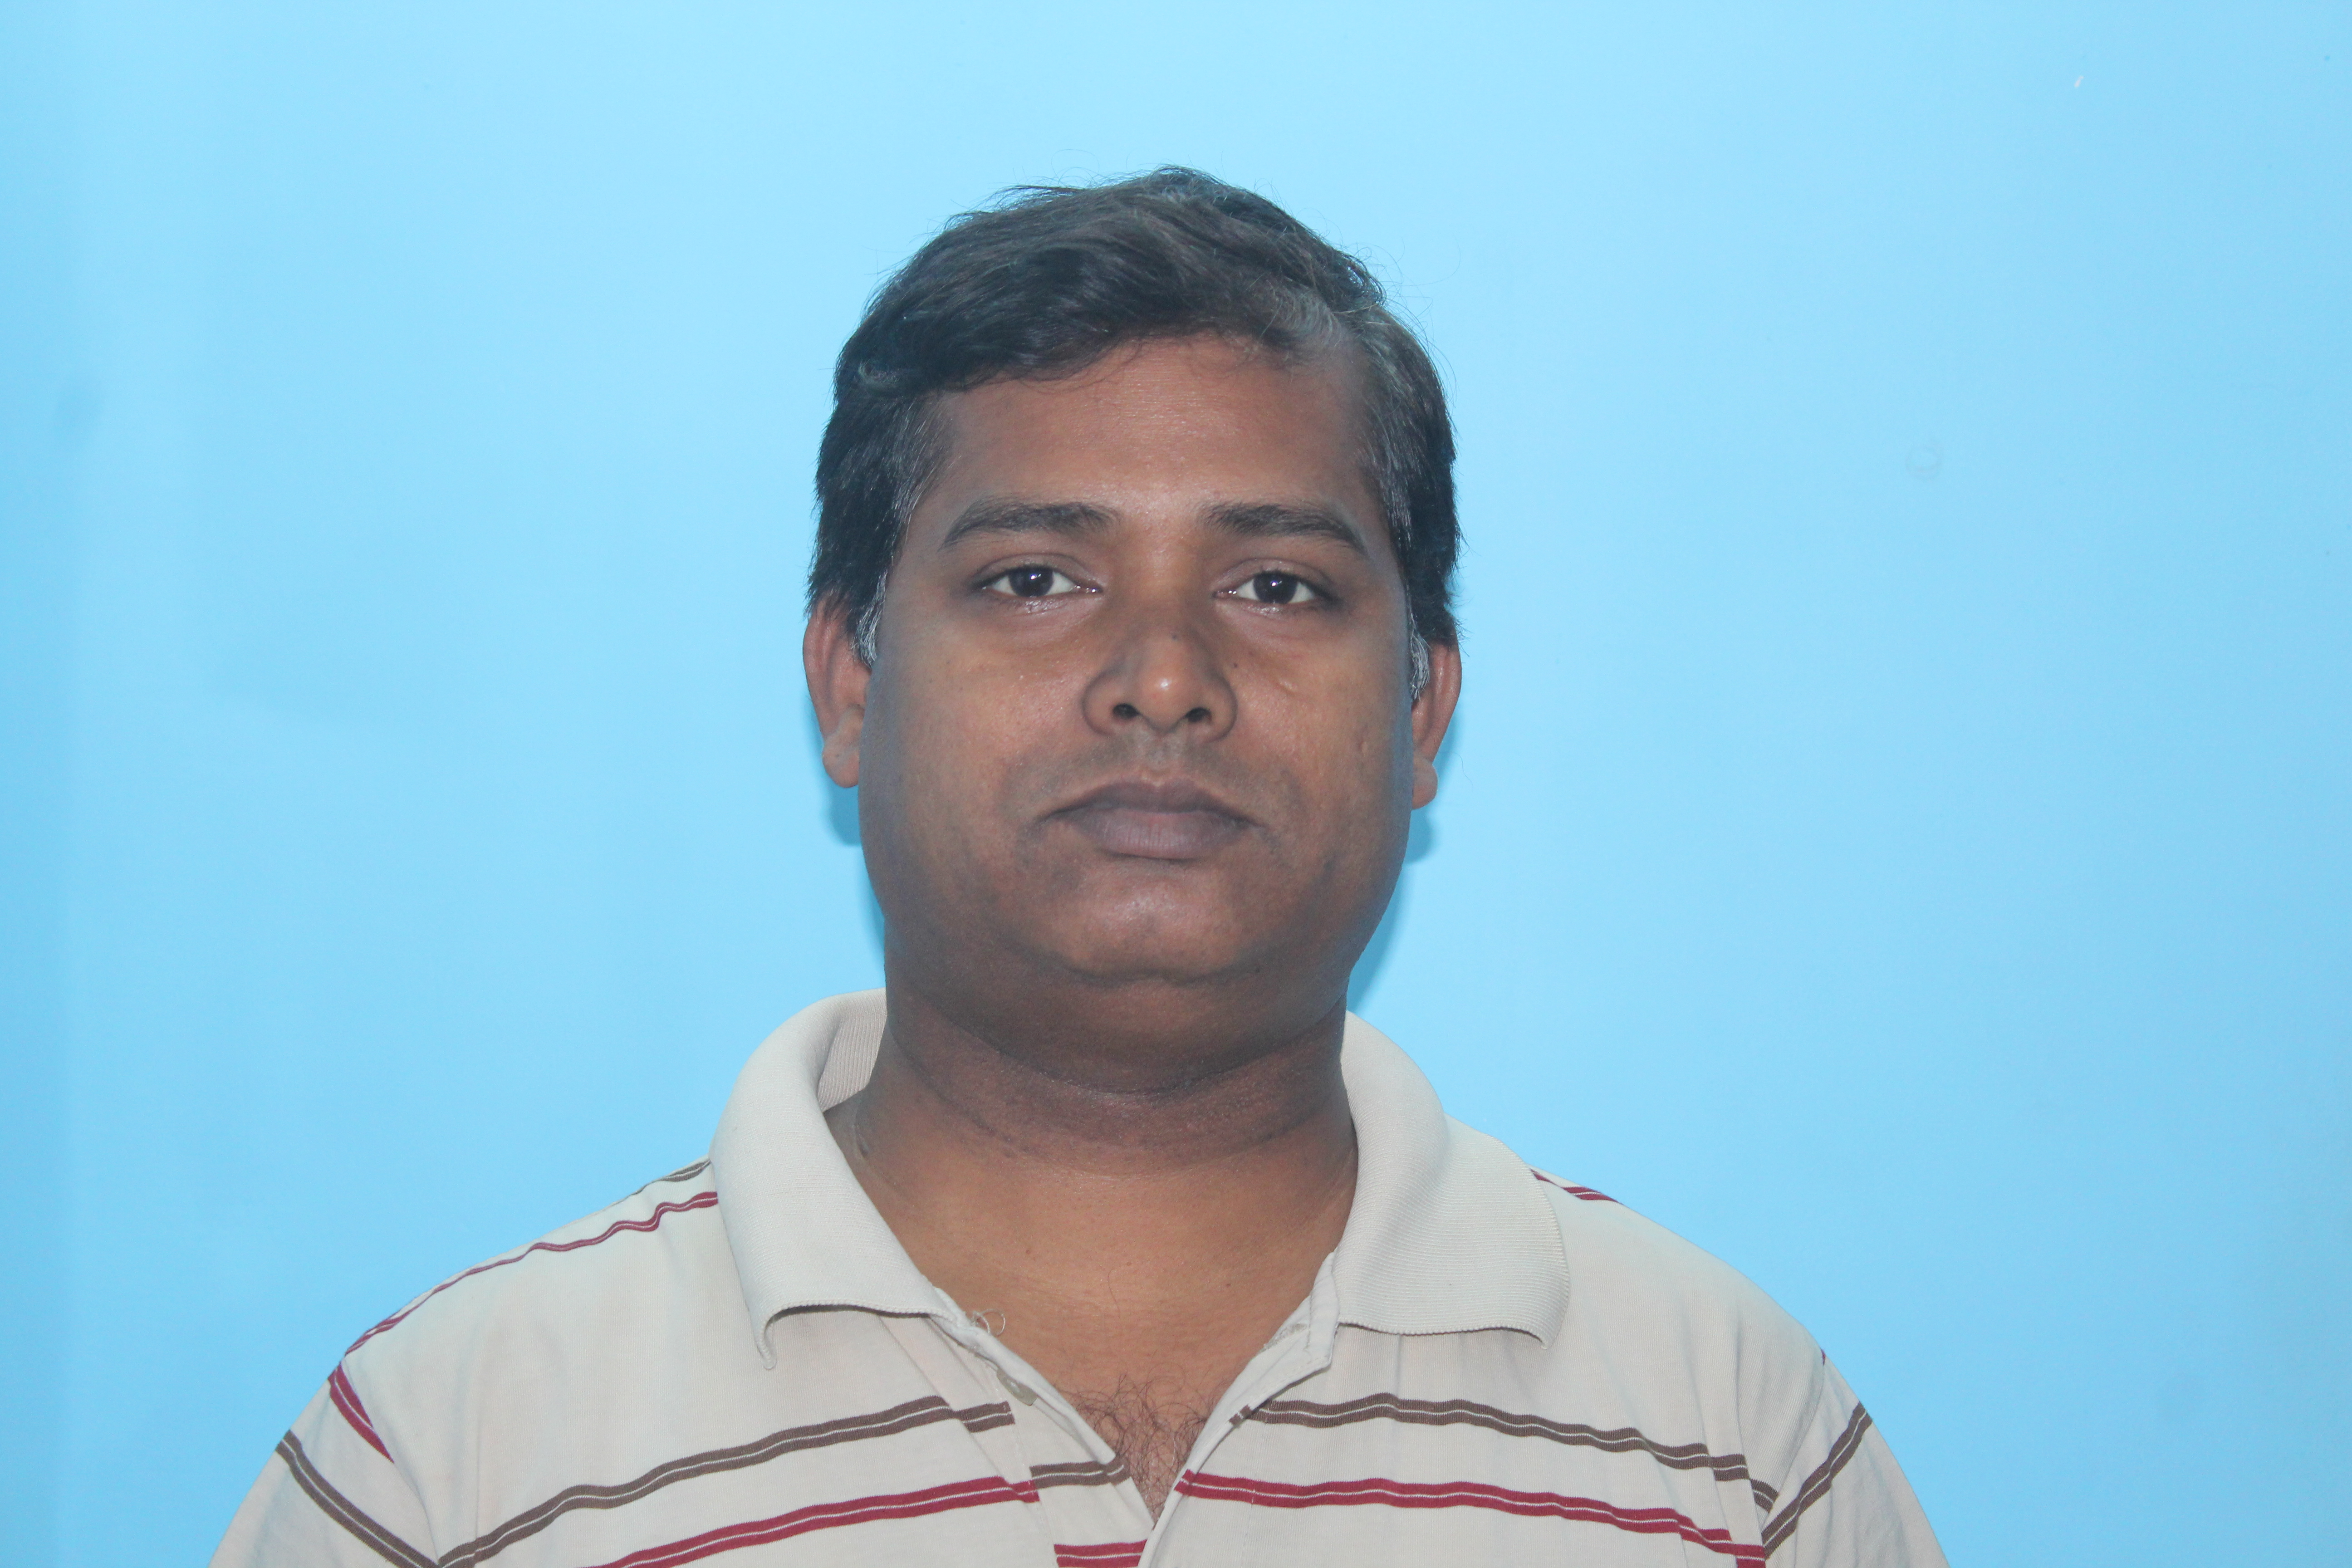 Rajeshwar Sharma